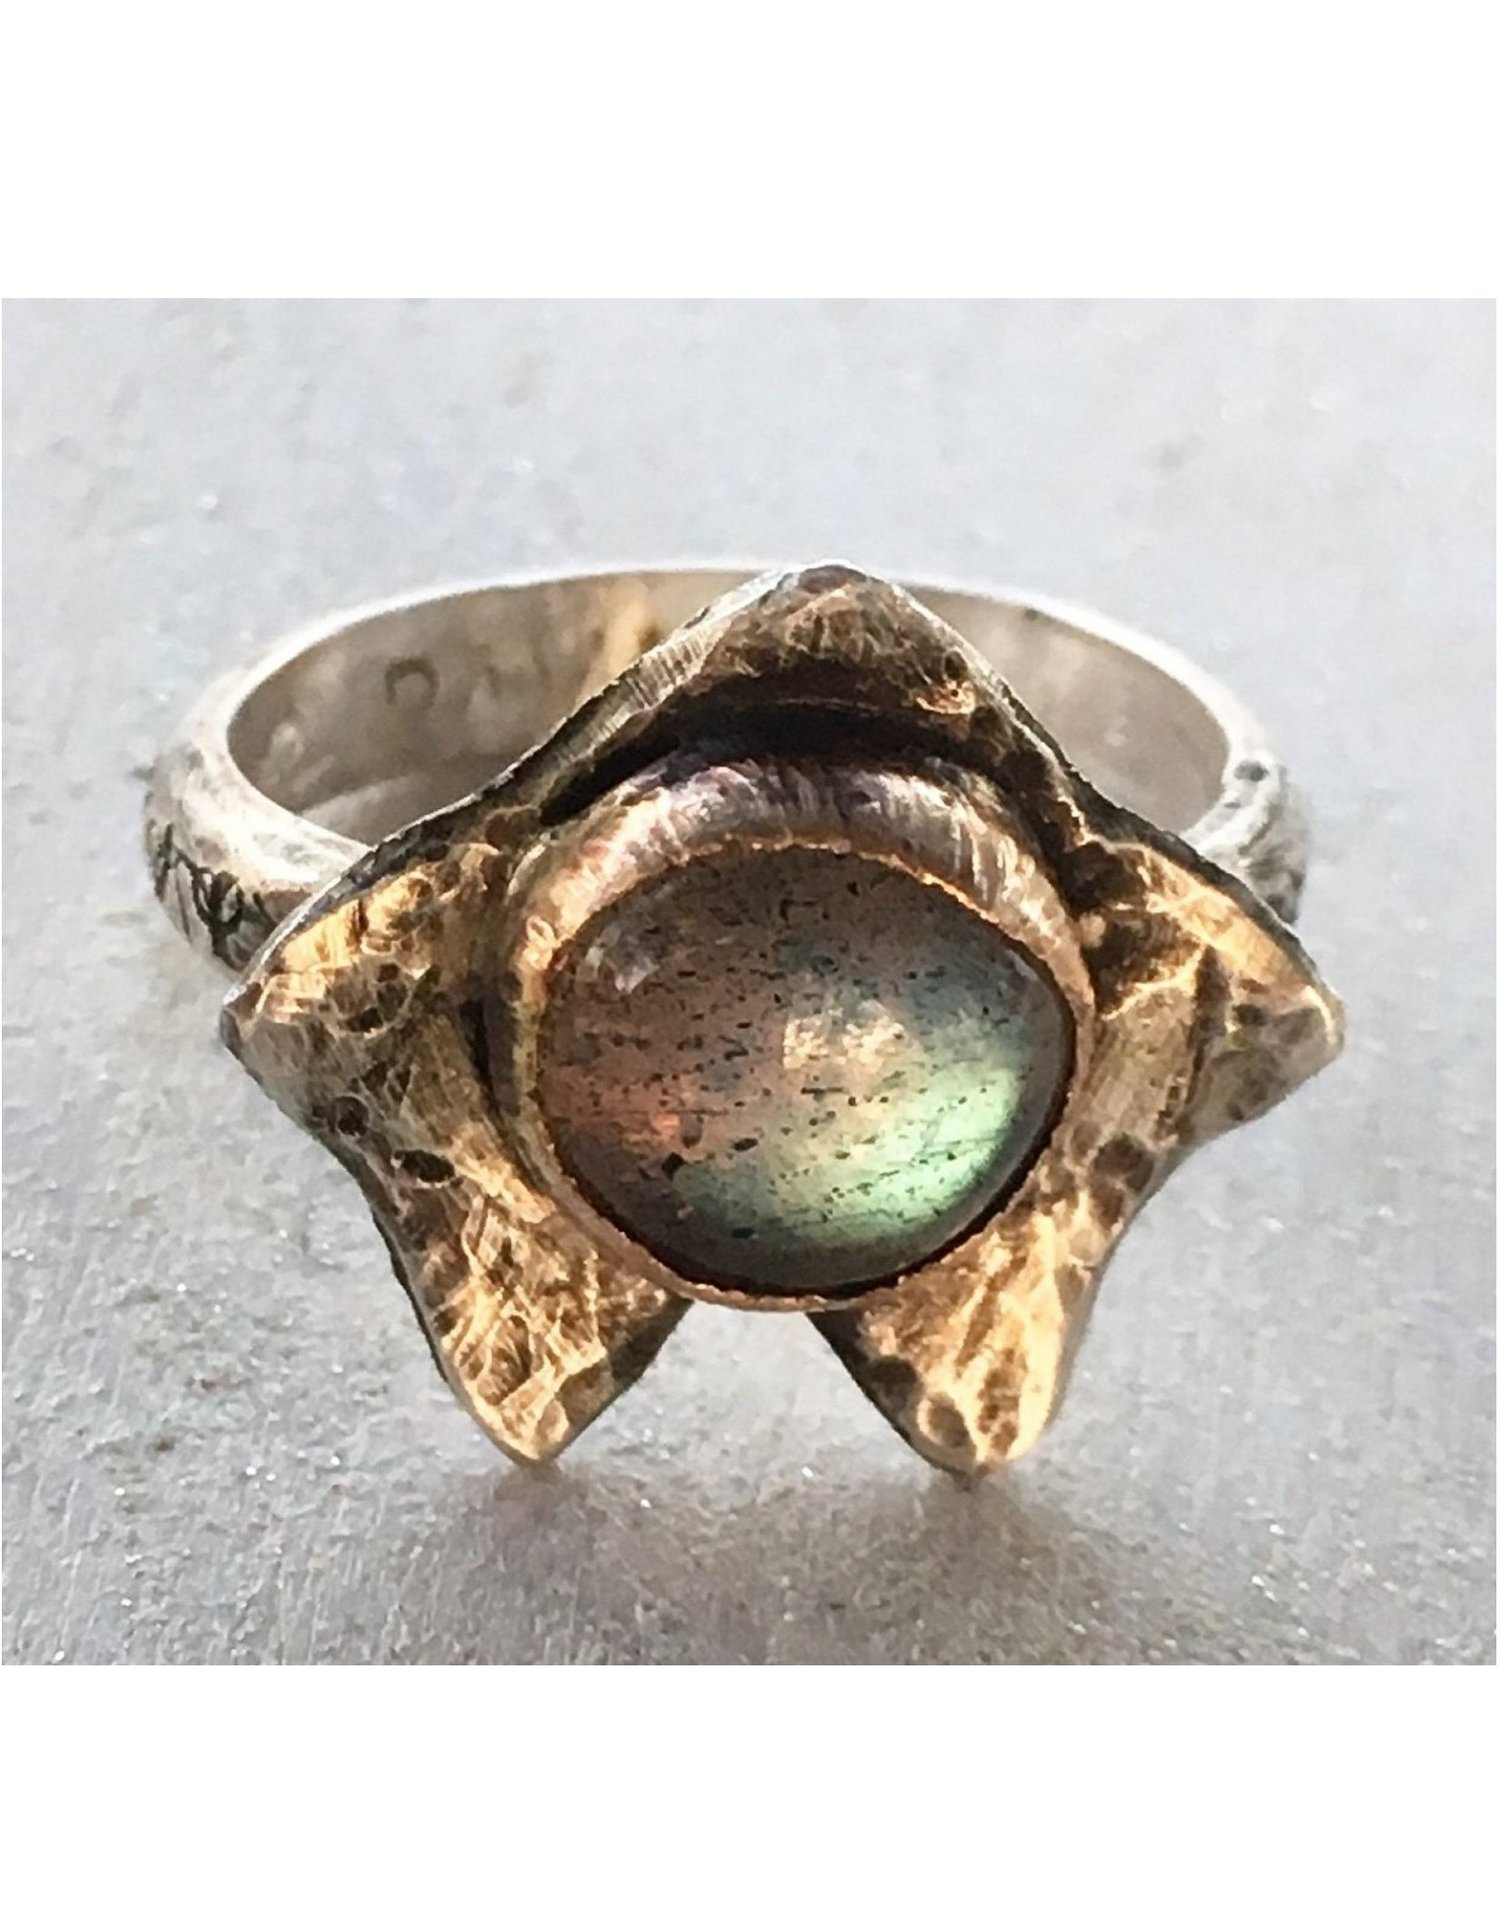 Pavanne Jewelry